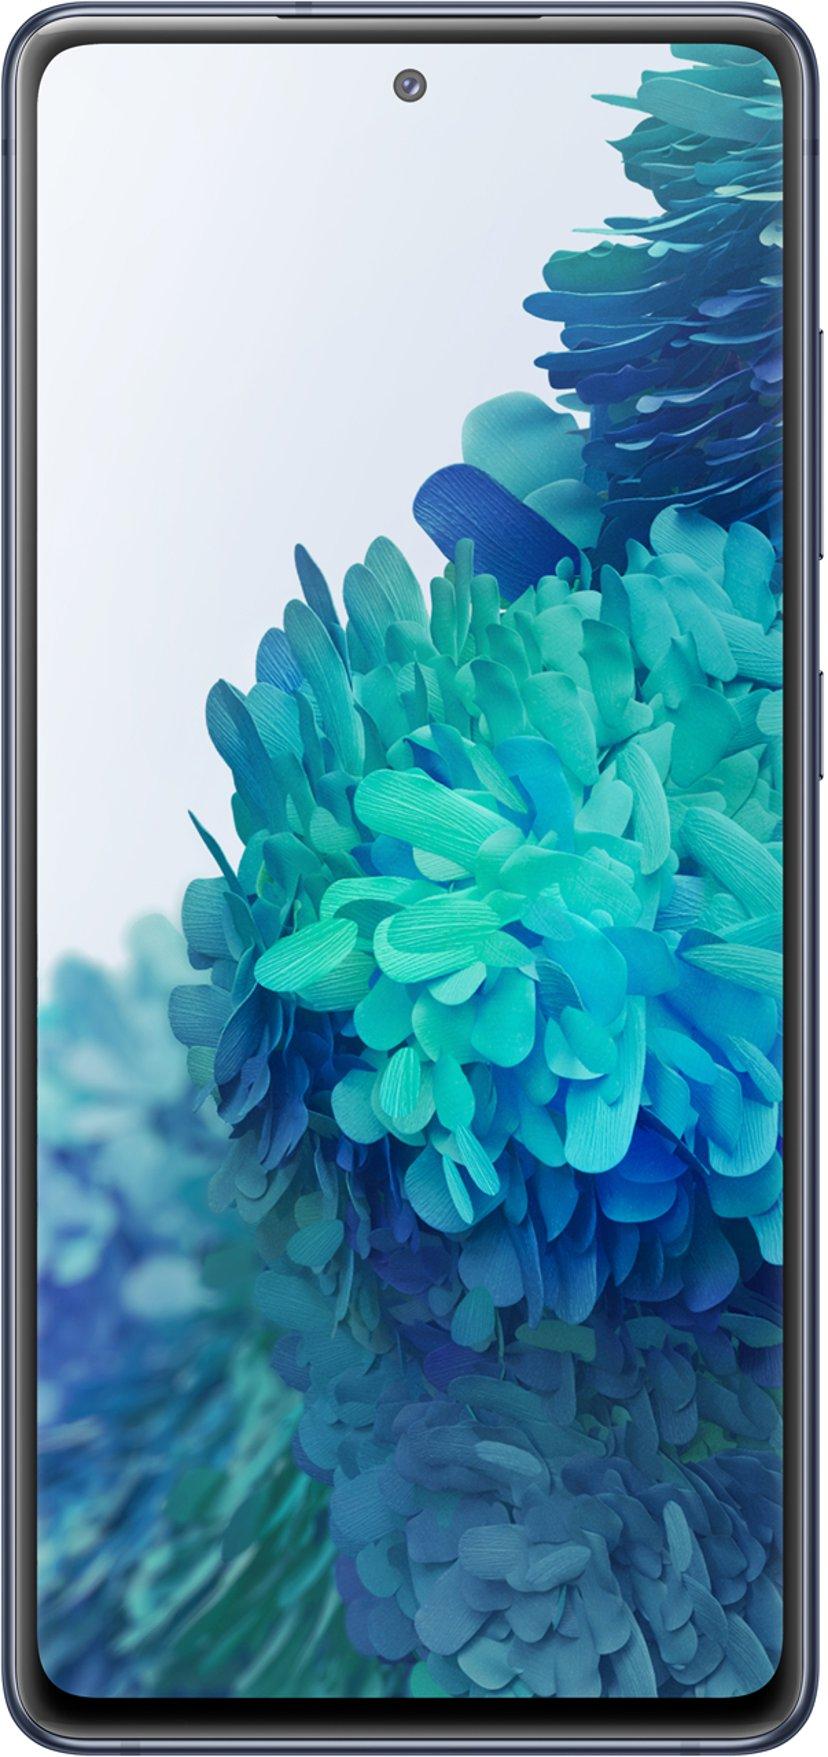 Samsung Galaxy S20 FE Dual-SIM Marinblått moln